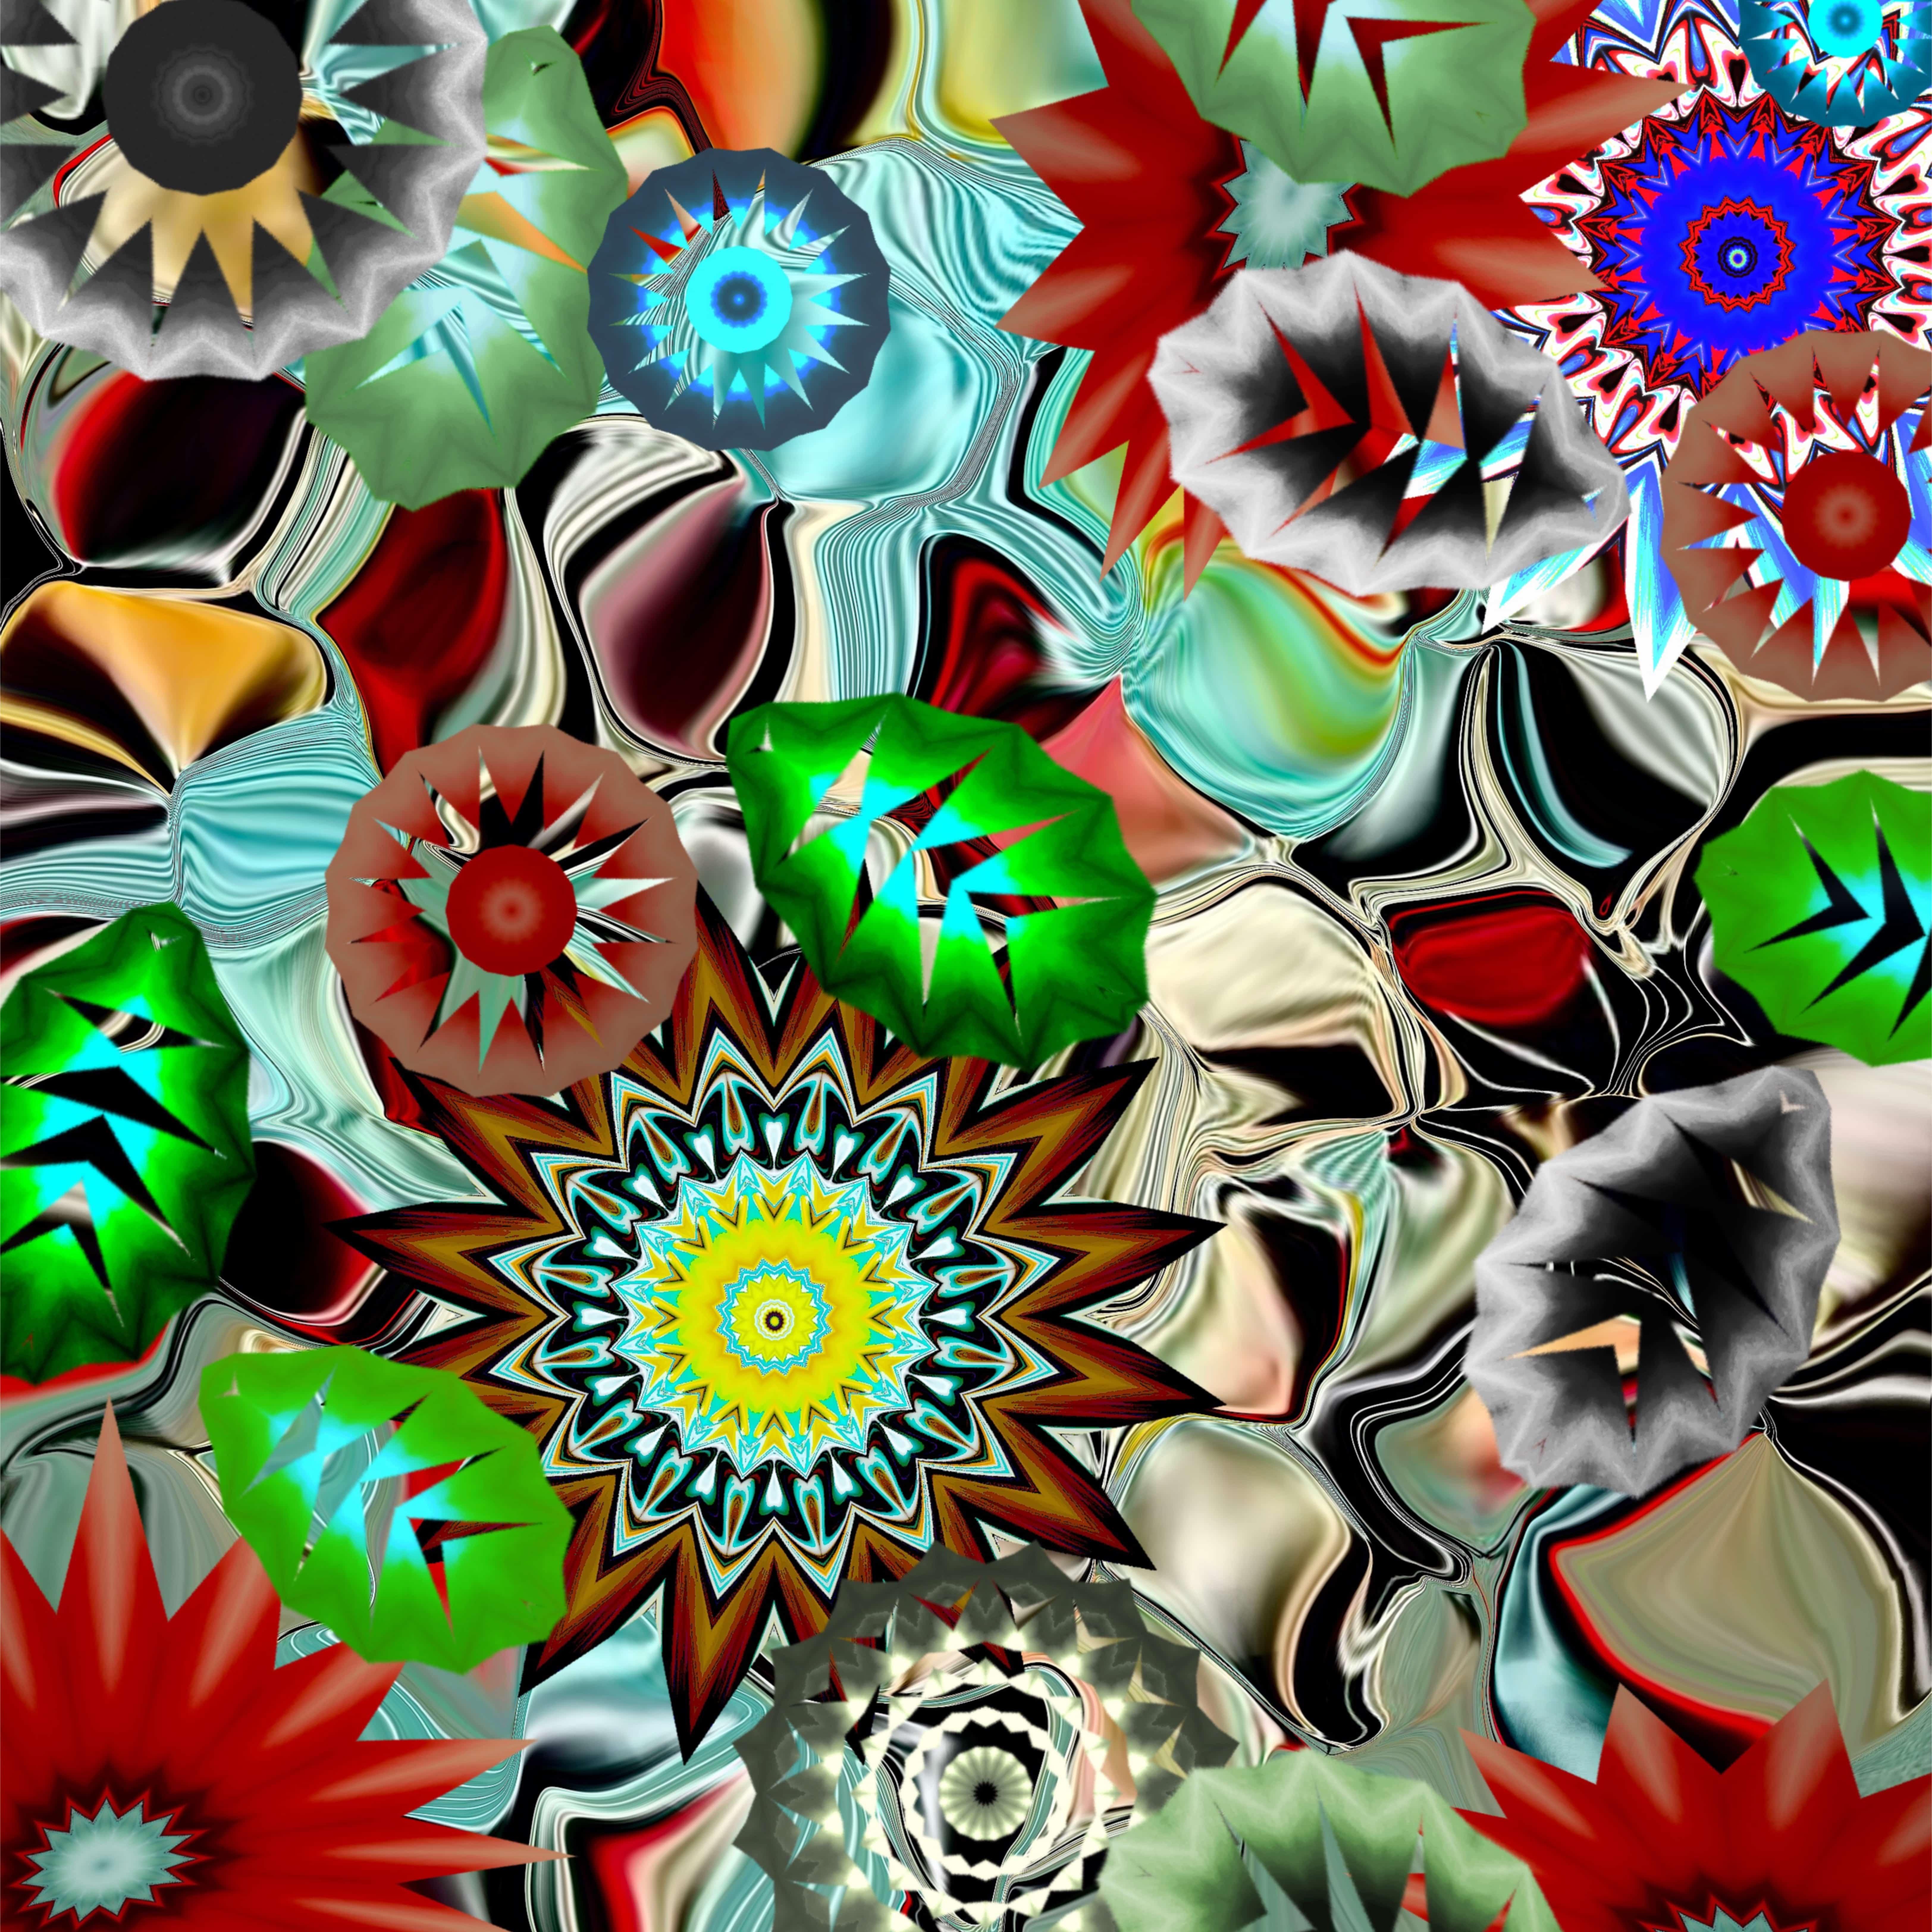 CAN'T GET NO SLEEP<br>Digital Art Print Under Acrylic Glass<br>Print Size : 15'' x 15''